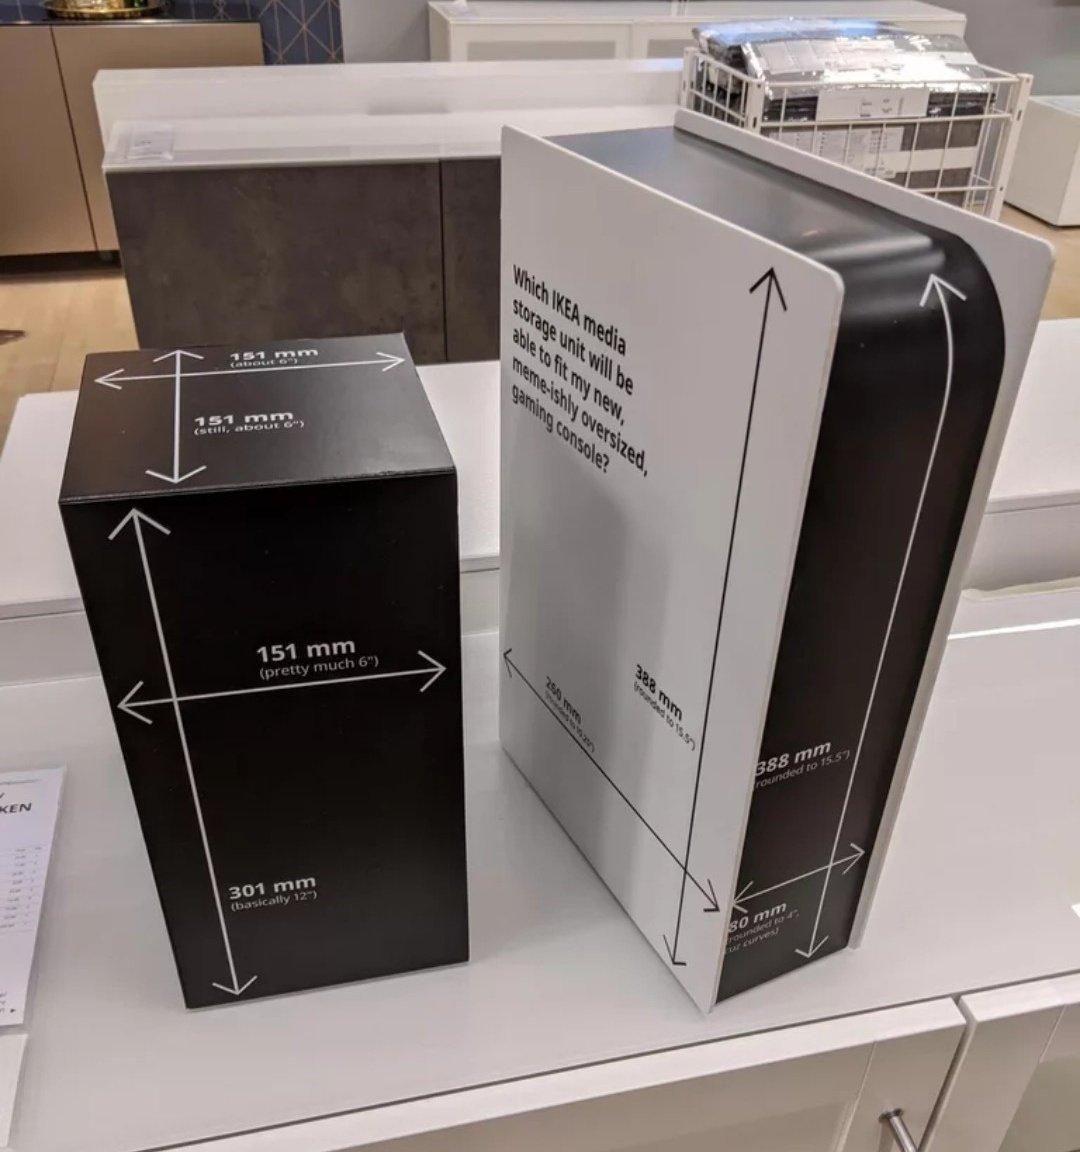 modelos das consolas na IKEA